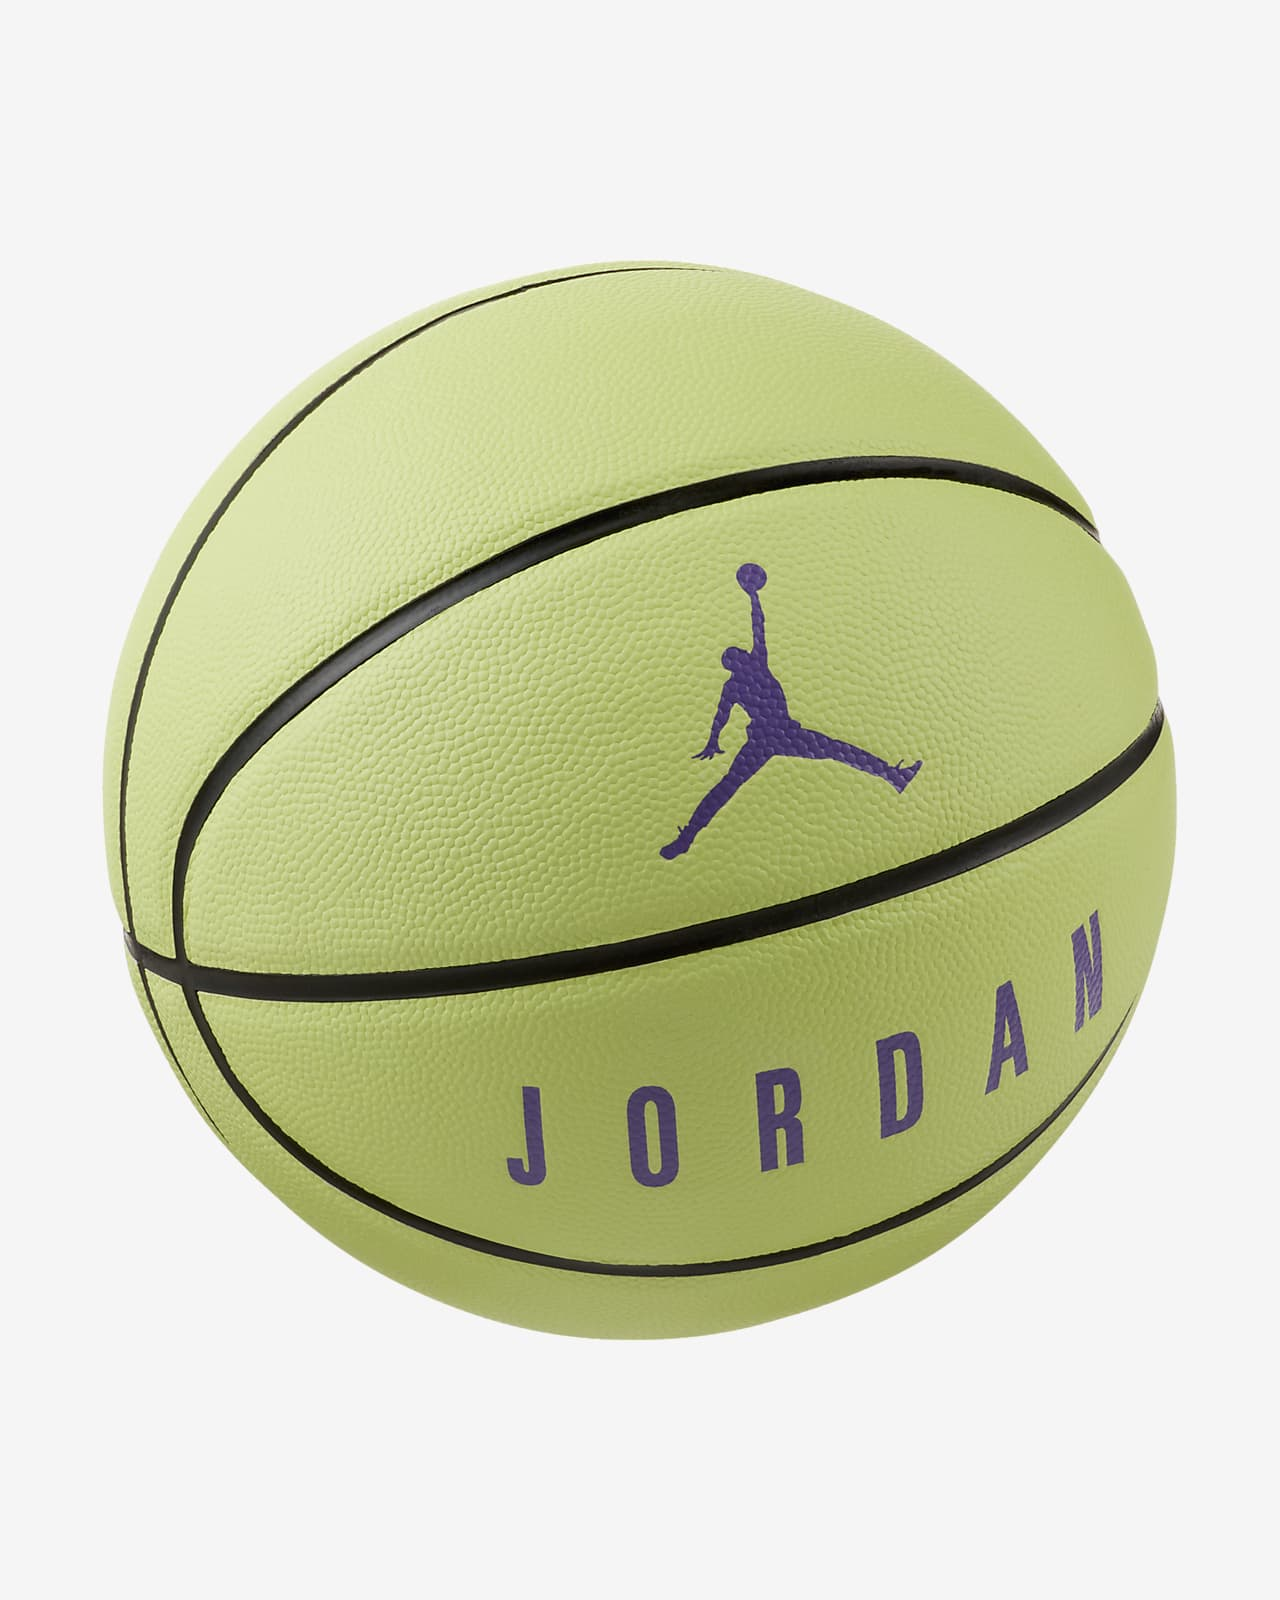 Pallone da basket Jordan Ultimate 8P